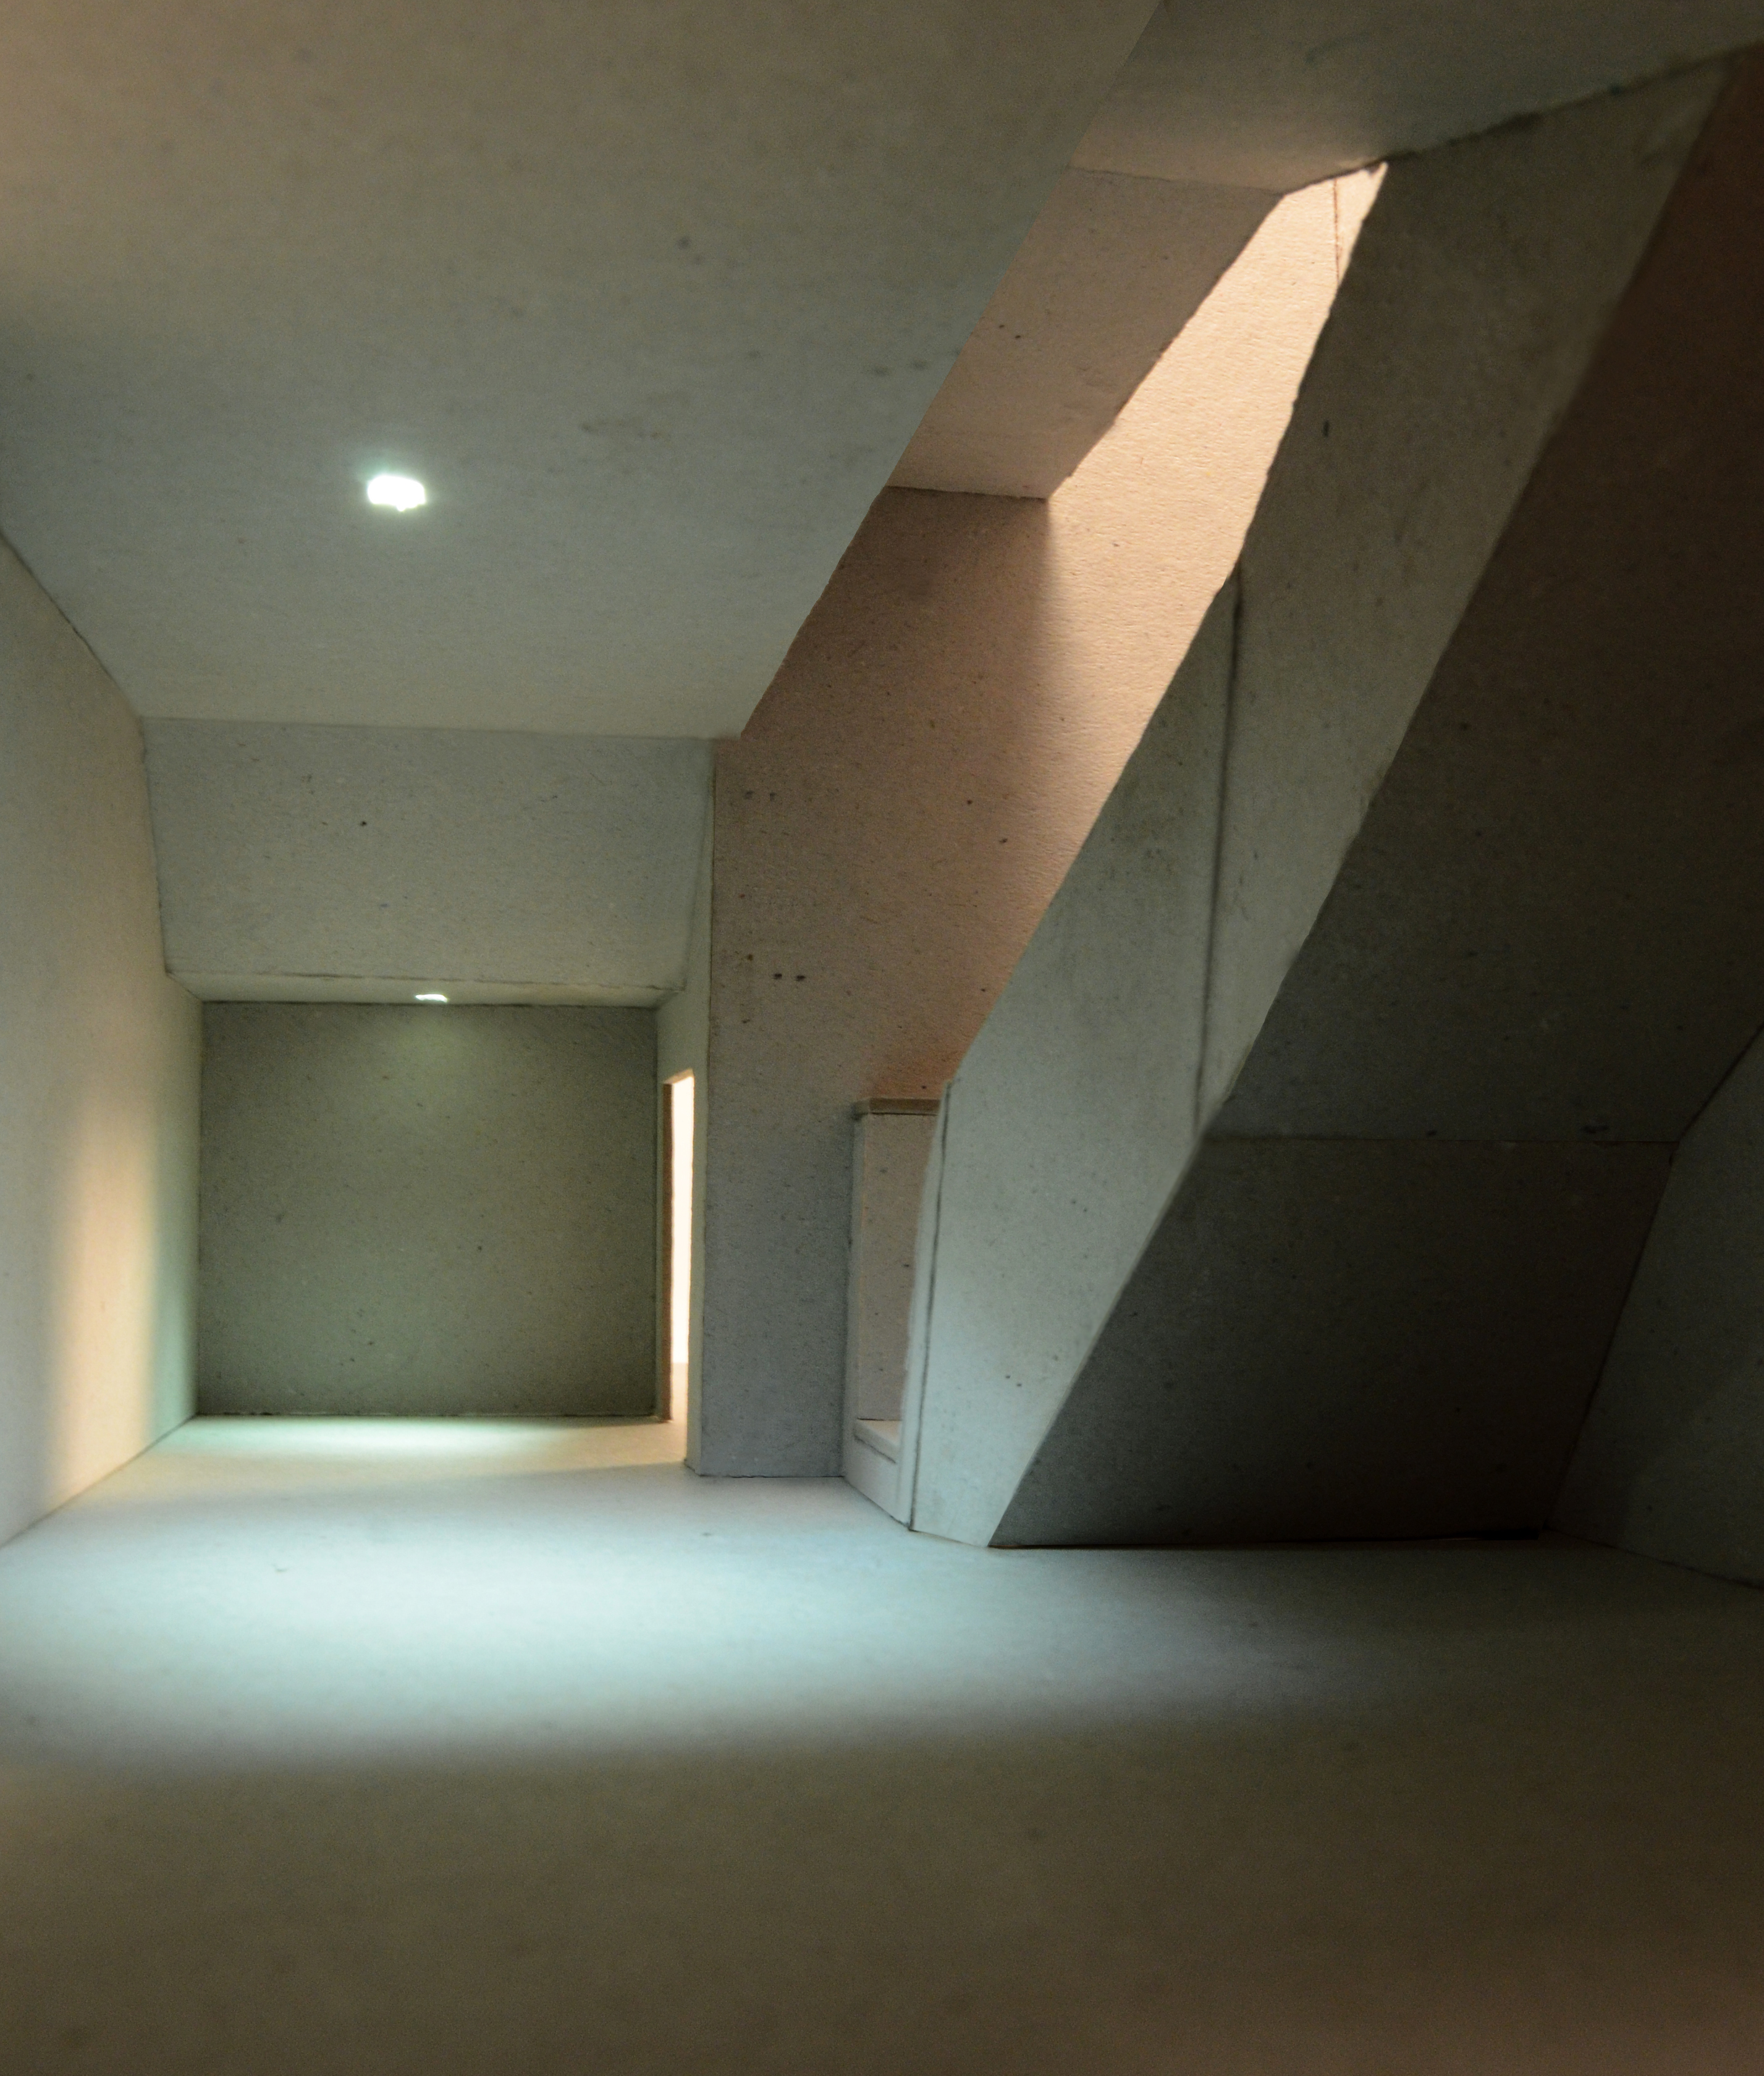 Modellbau nach einem Architektur-Fot